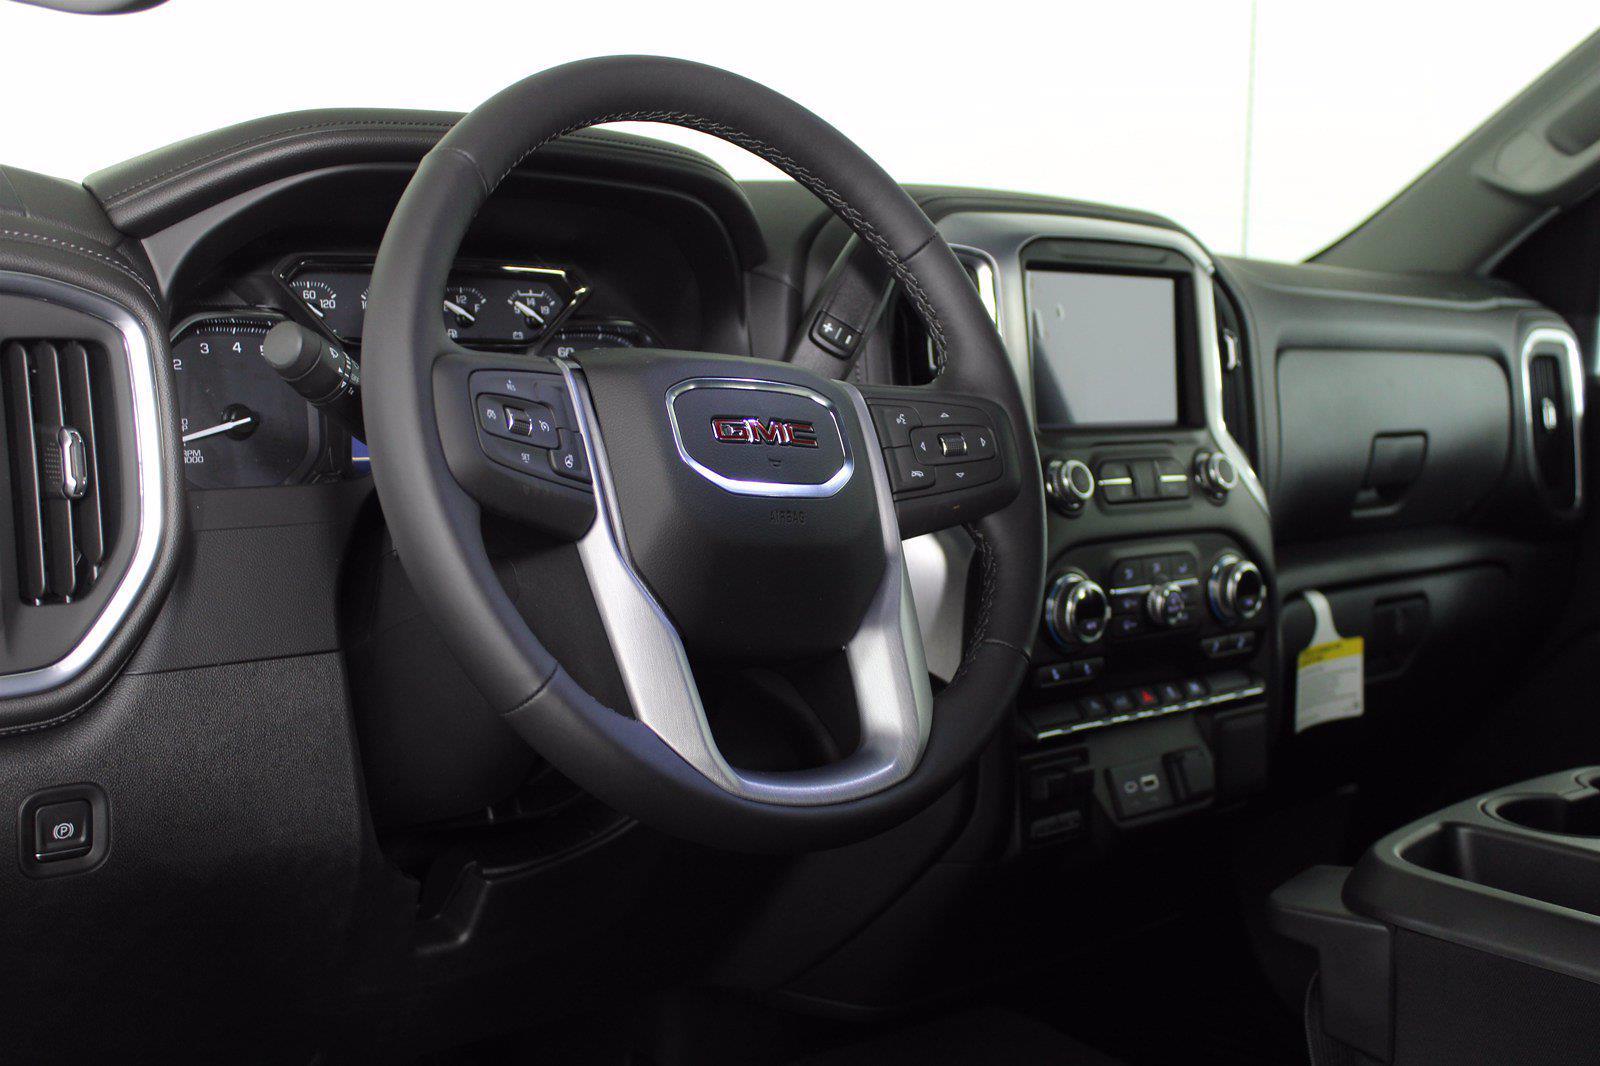 2021 GMC Sierra 1500 Crew Cab 4x4, Pickup #D411035 - photo 10